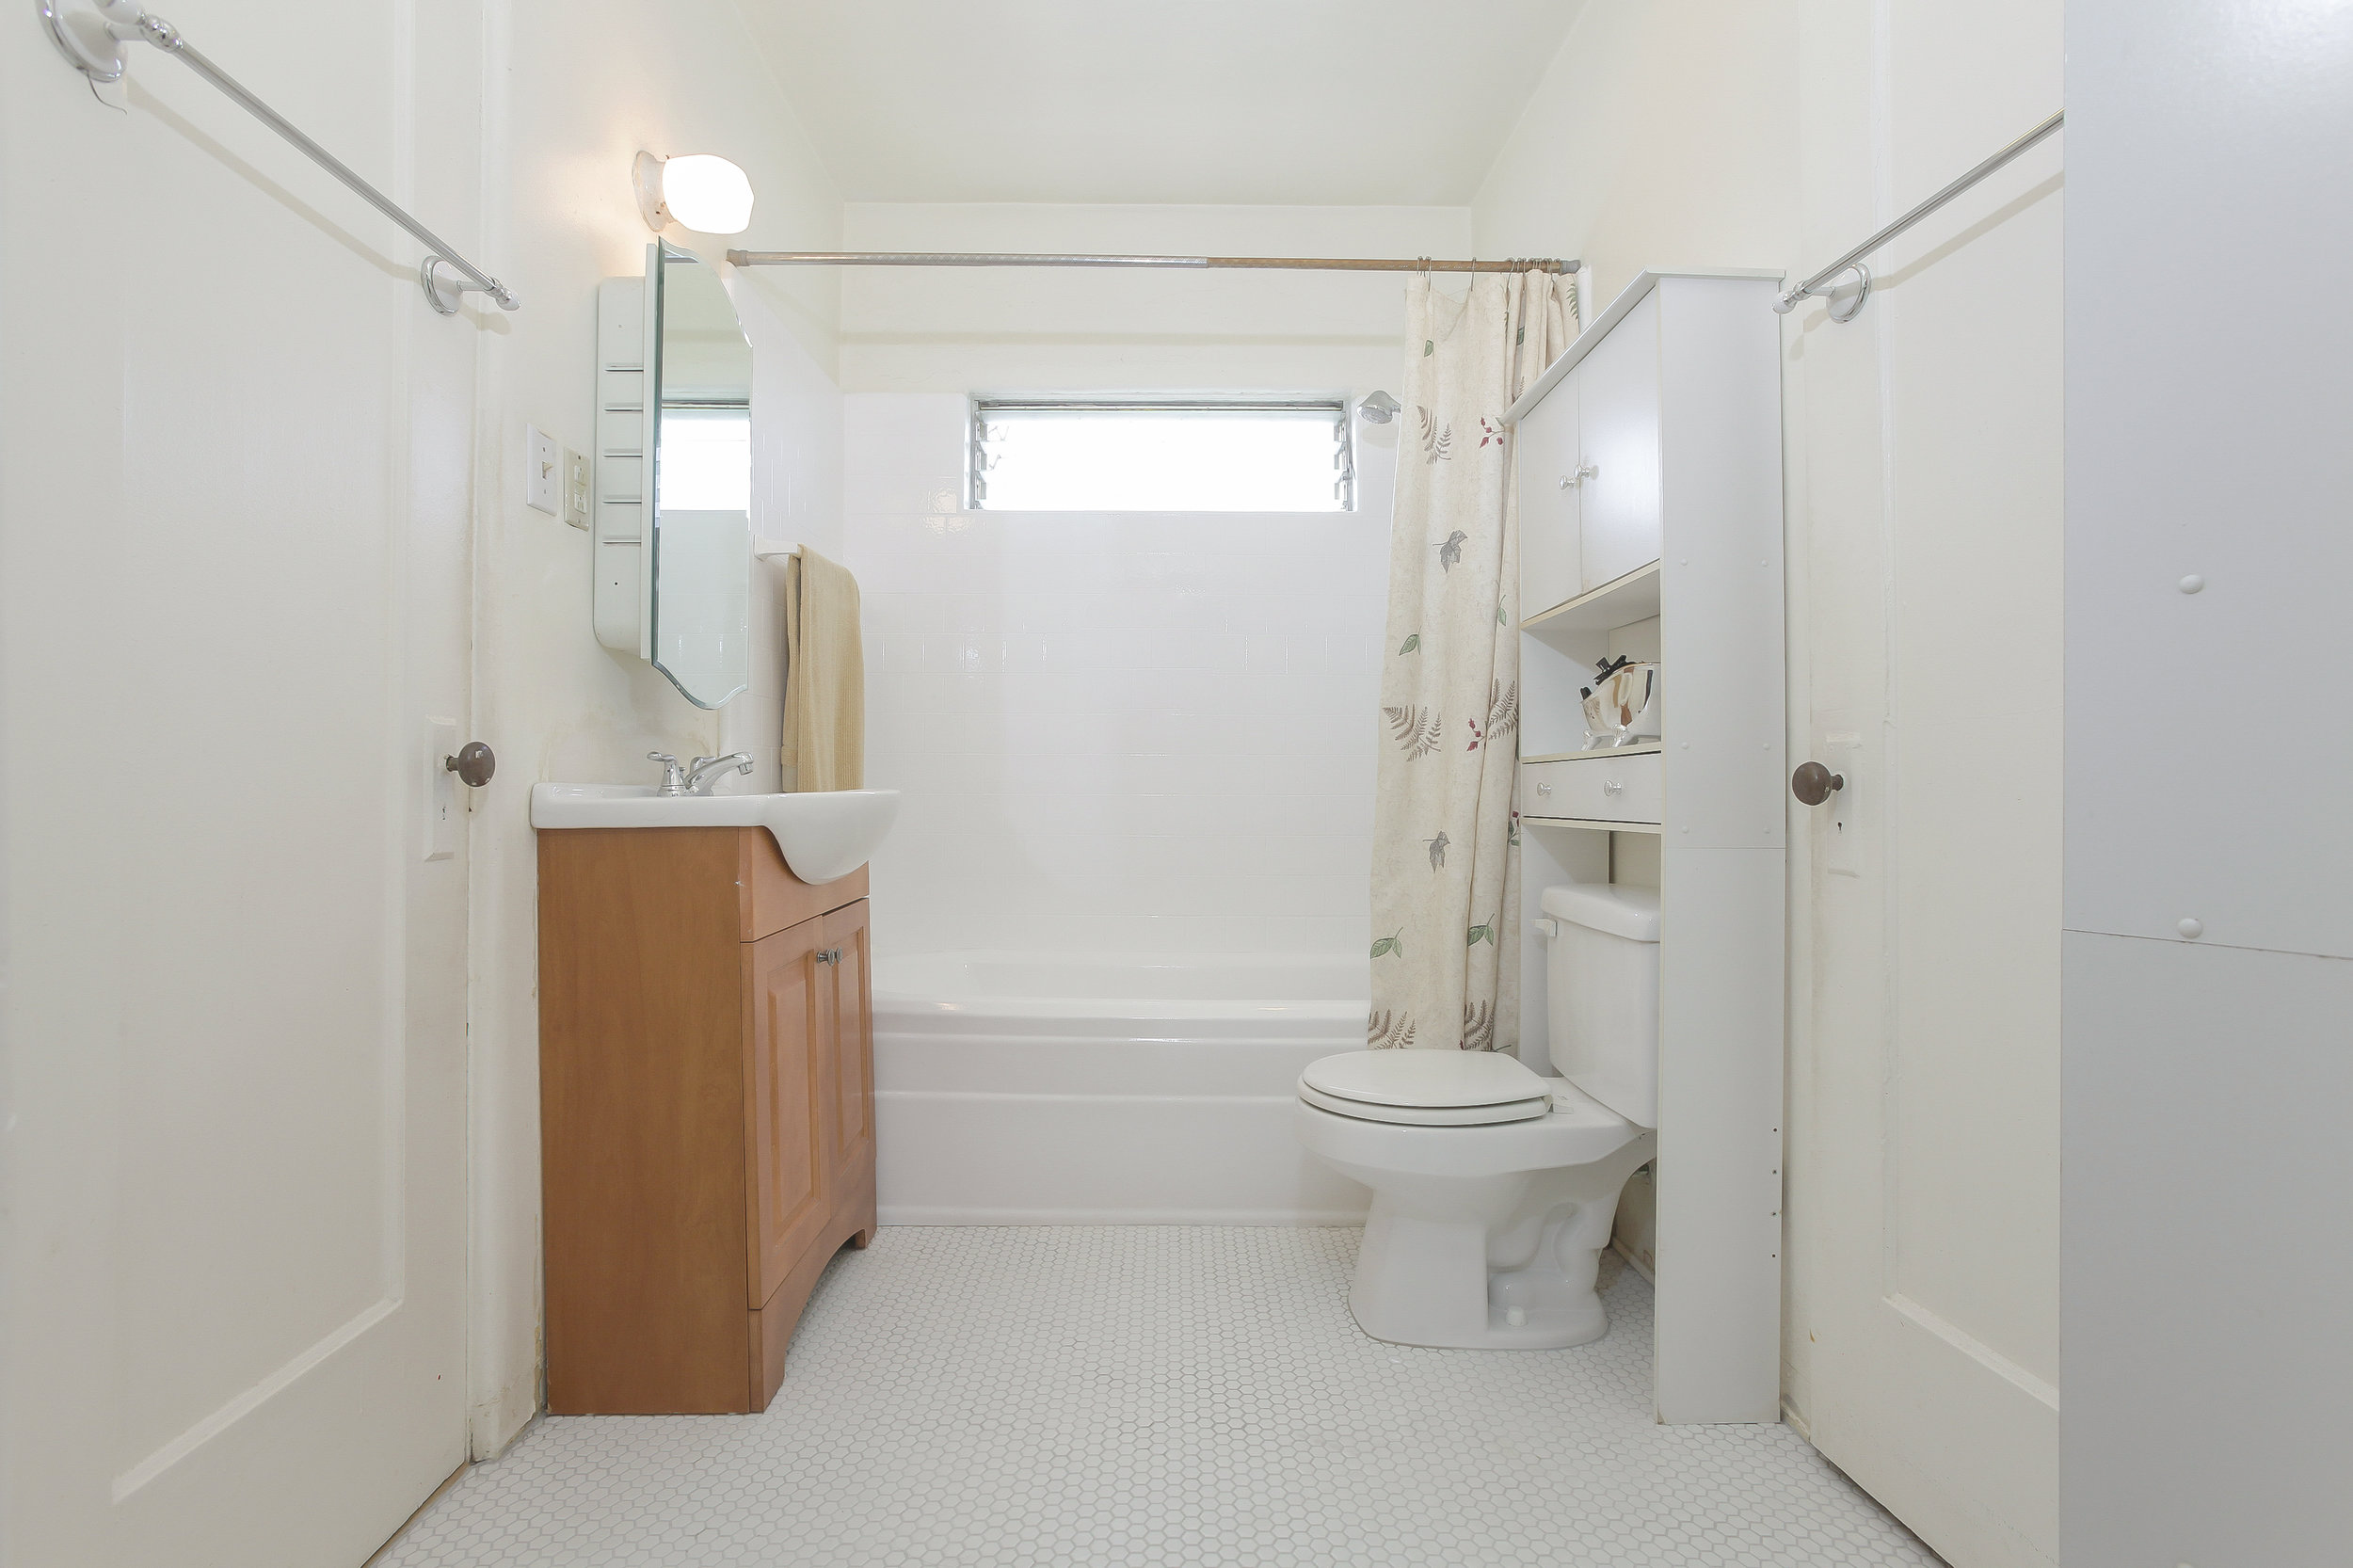 027-Bathroom-4526141-large.jpg